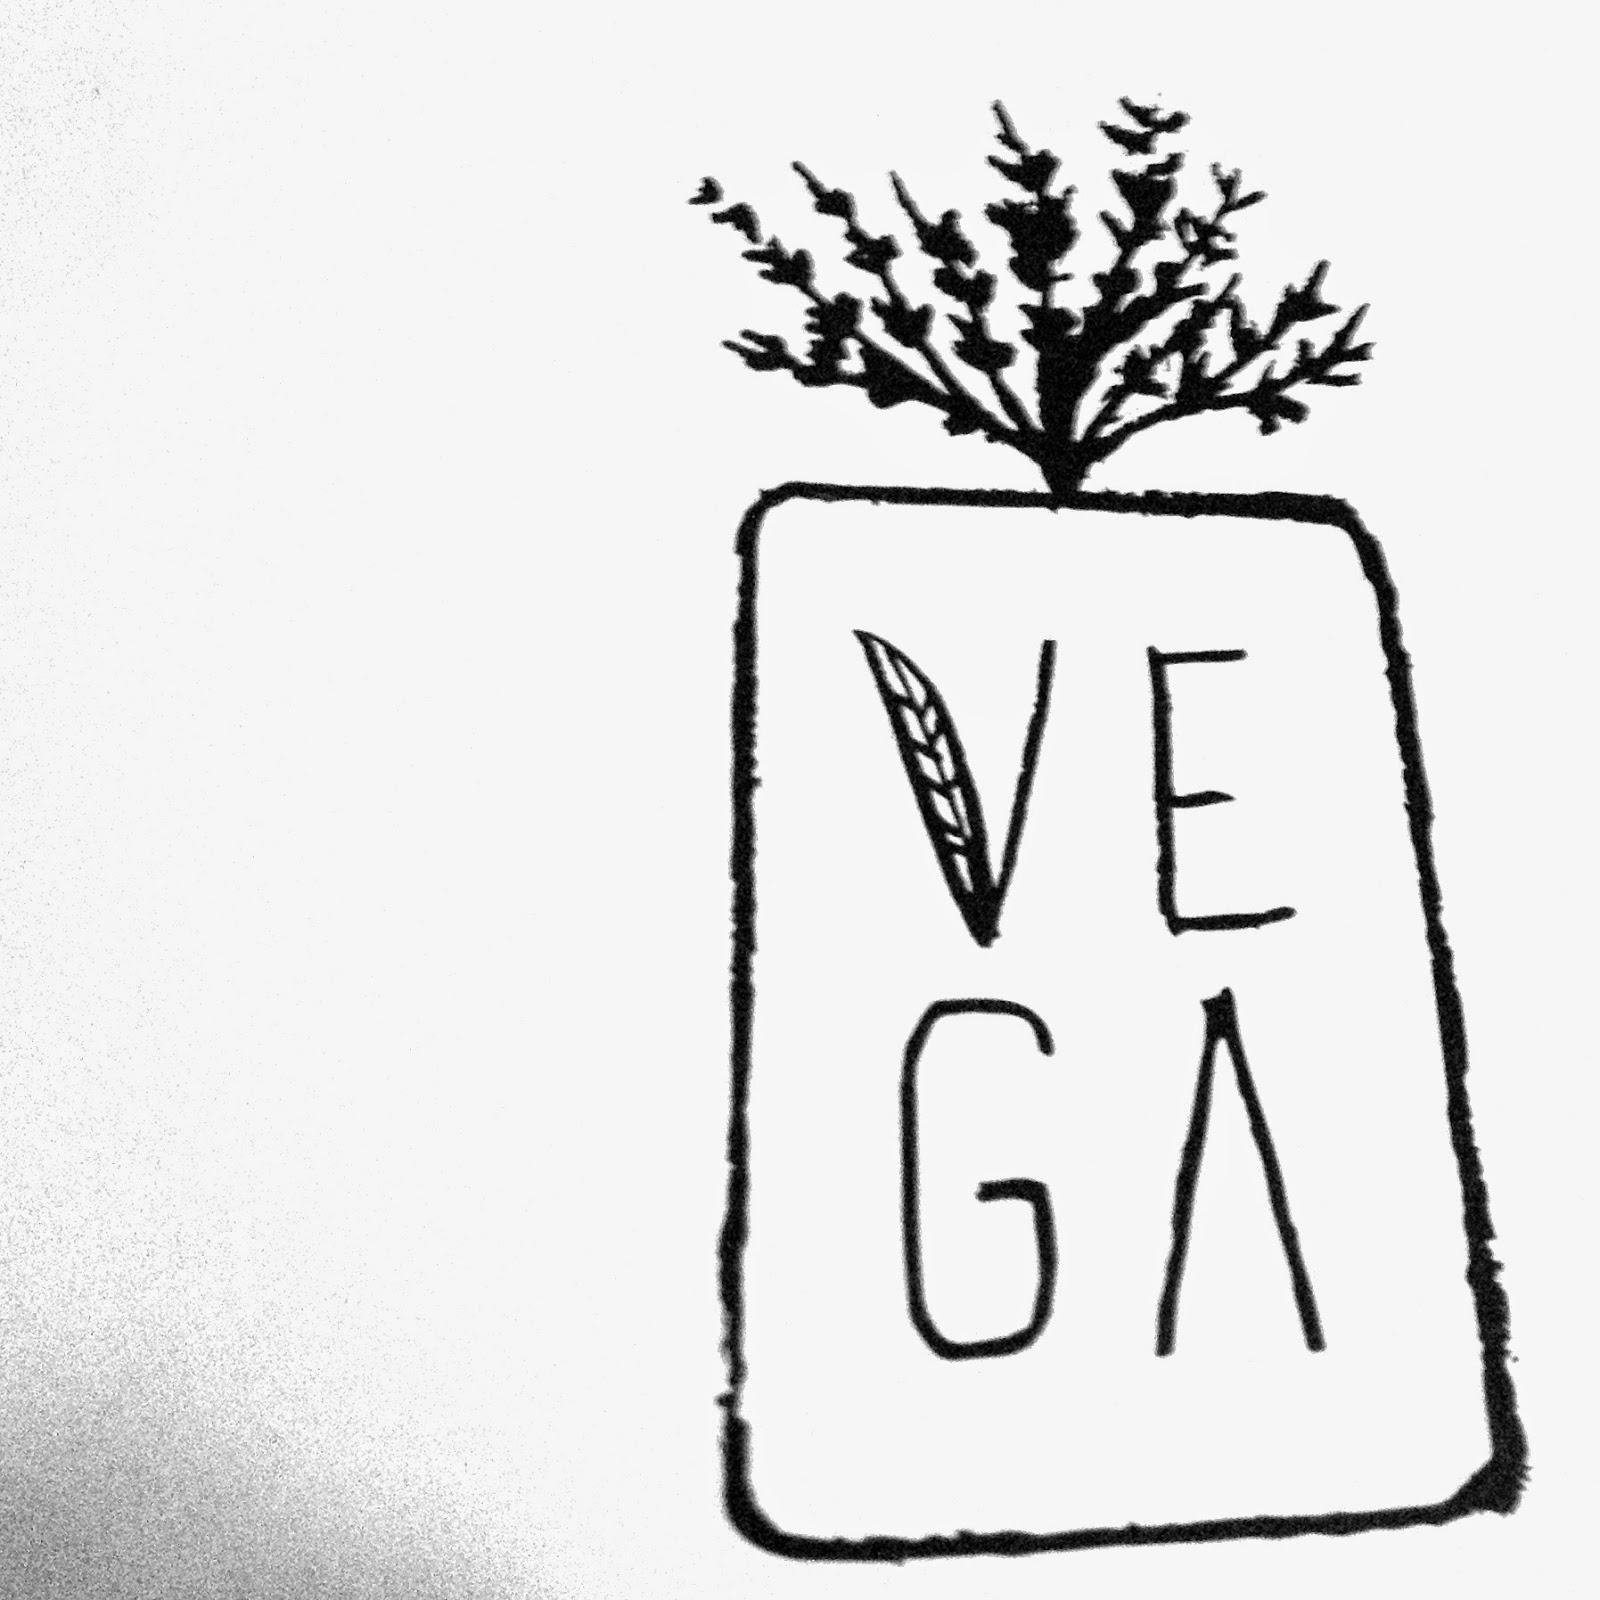 Vega restaurante vegano vegetariano Madrid Malasaña Calle Luna 9 callao